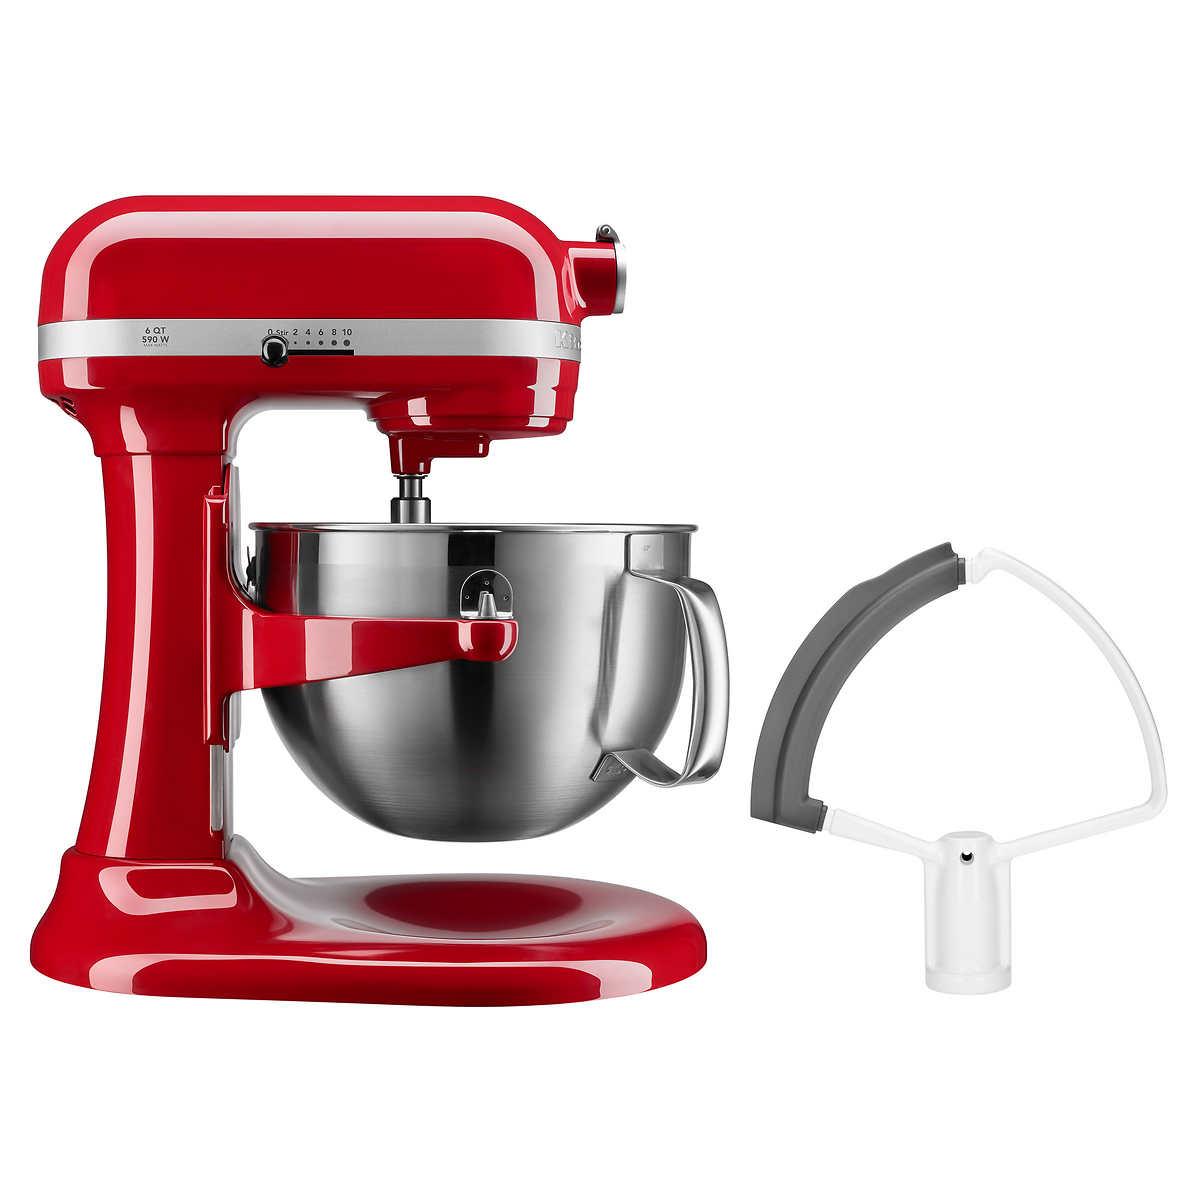 Kitchenaid Professional Series 6 Quart Bowl Lift Stand Mixer With Flex Edge Costco